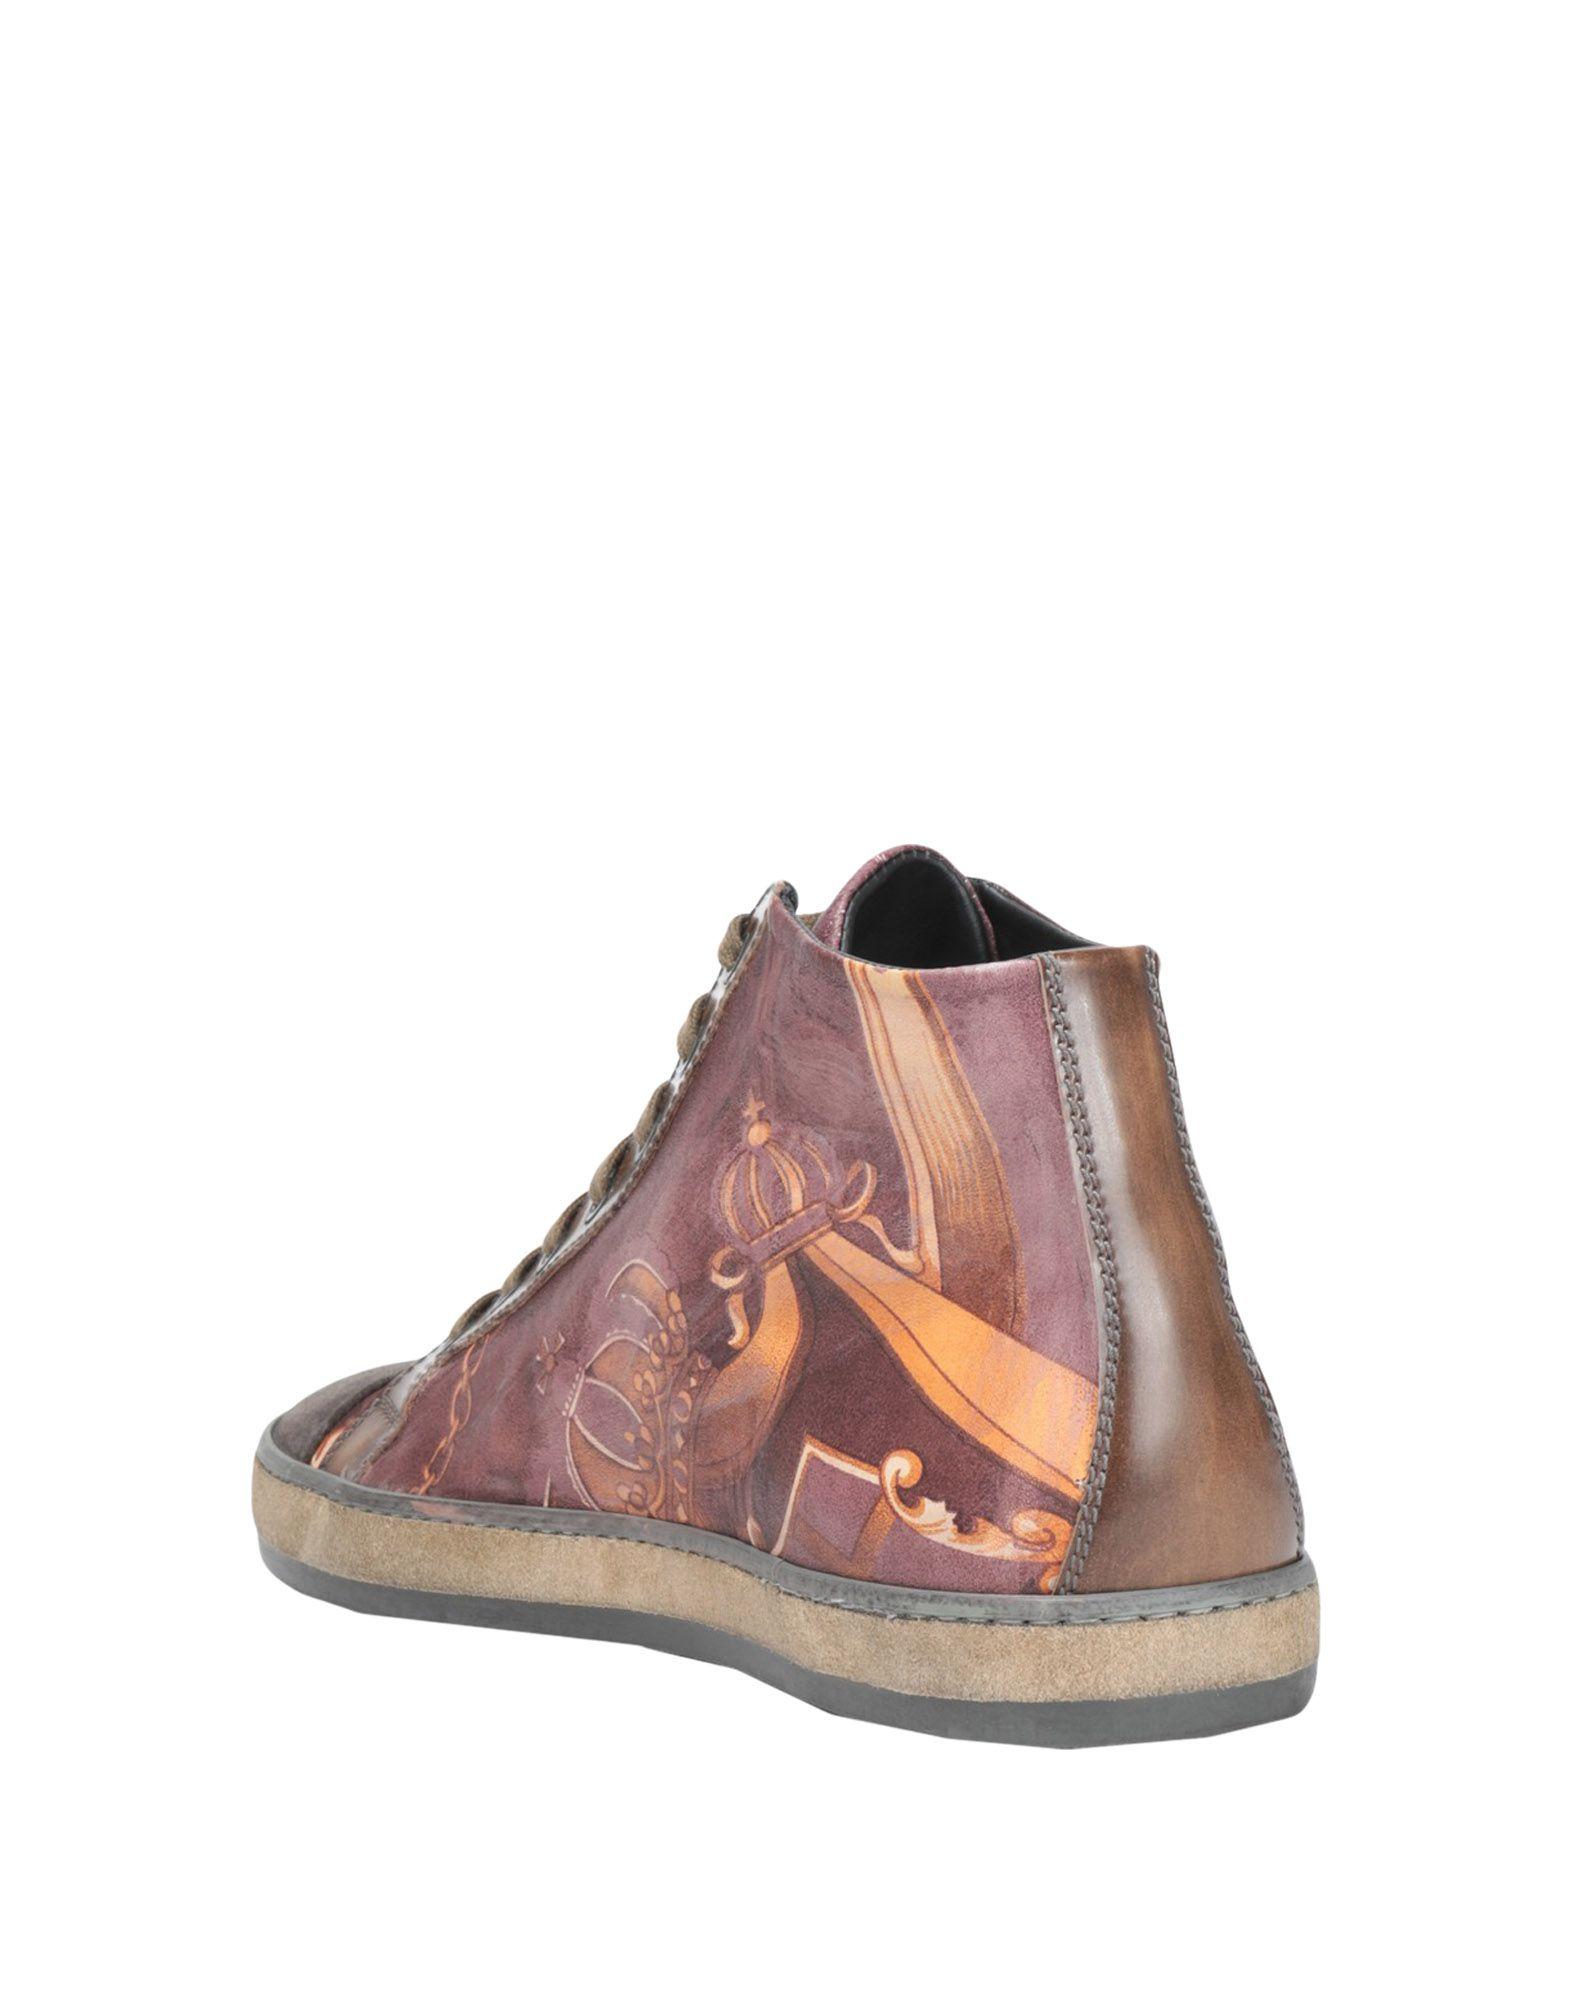 Stilvolle Sneakers billige Schuhe Soisire Soiebleu Sneakers Stilvolle Damen  11478867TP 6e12db